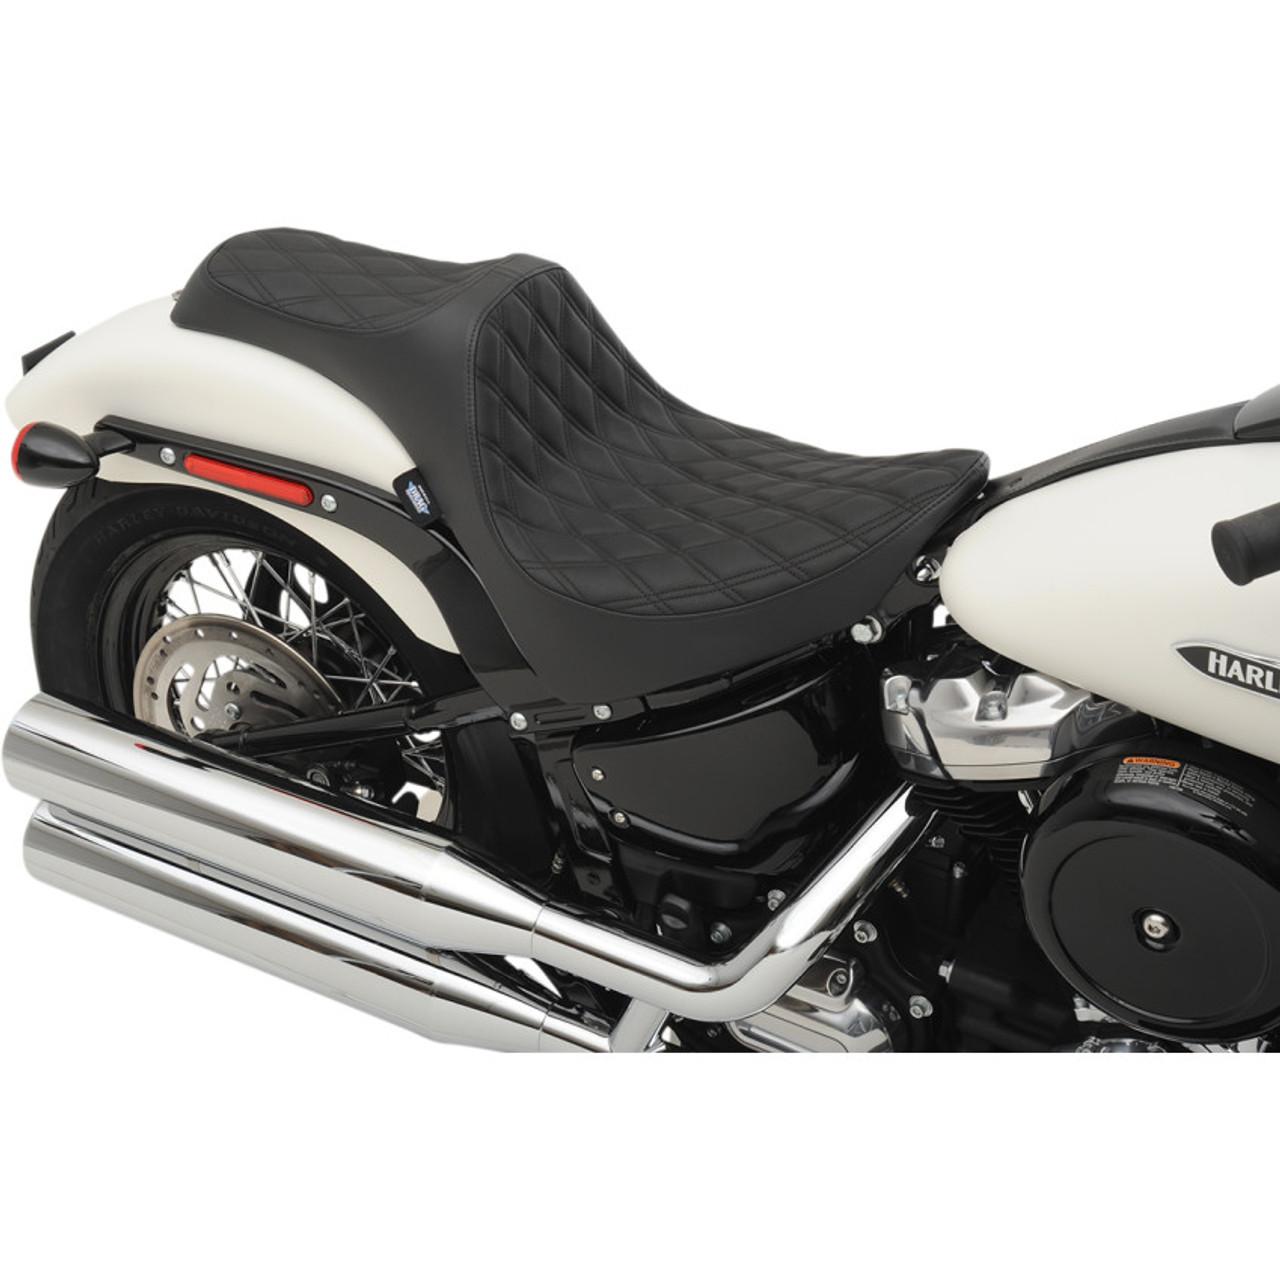 3c788a2cc57a0 Drag Specialties Predator III Seat for 2018-2019 Harley Softail* - Double  Diamond Black